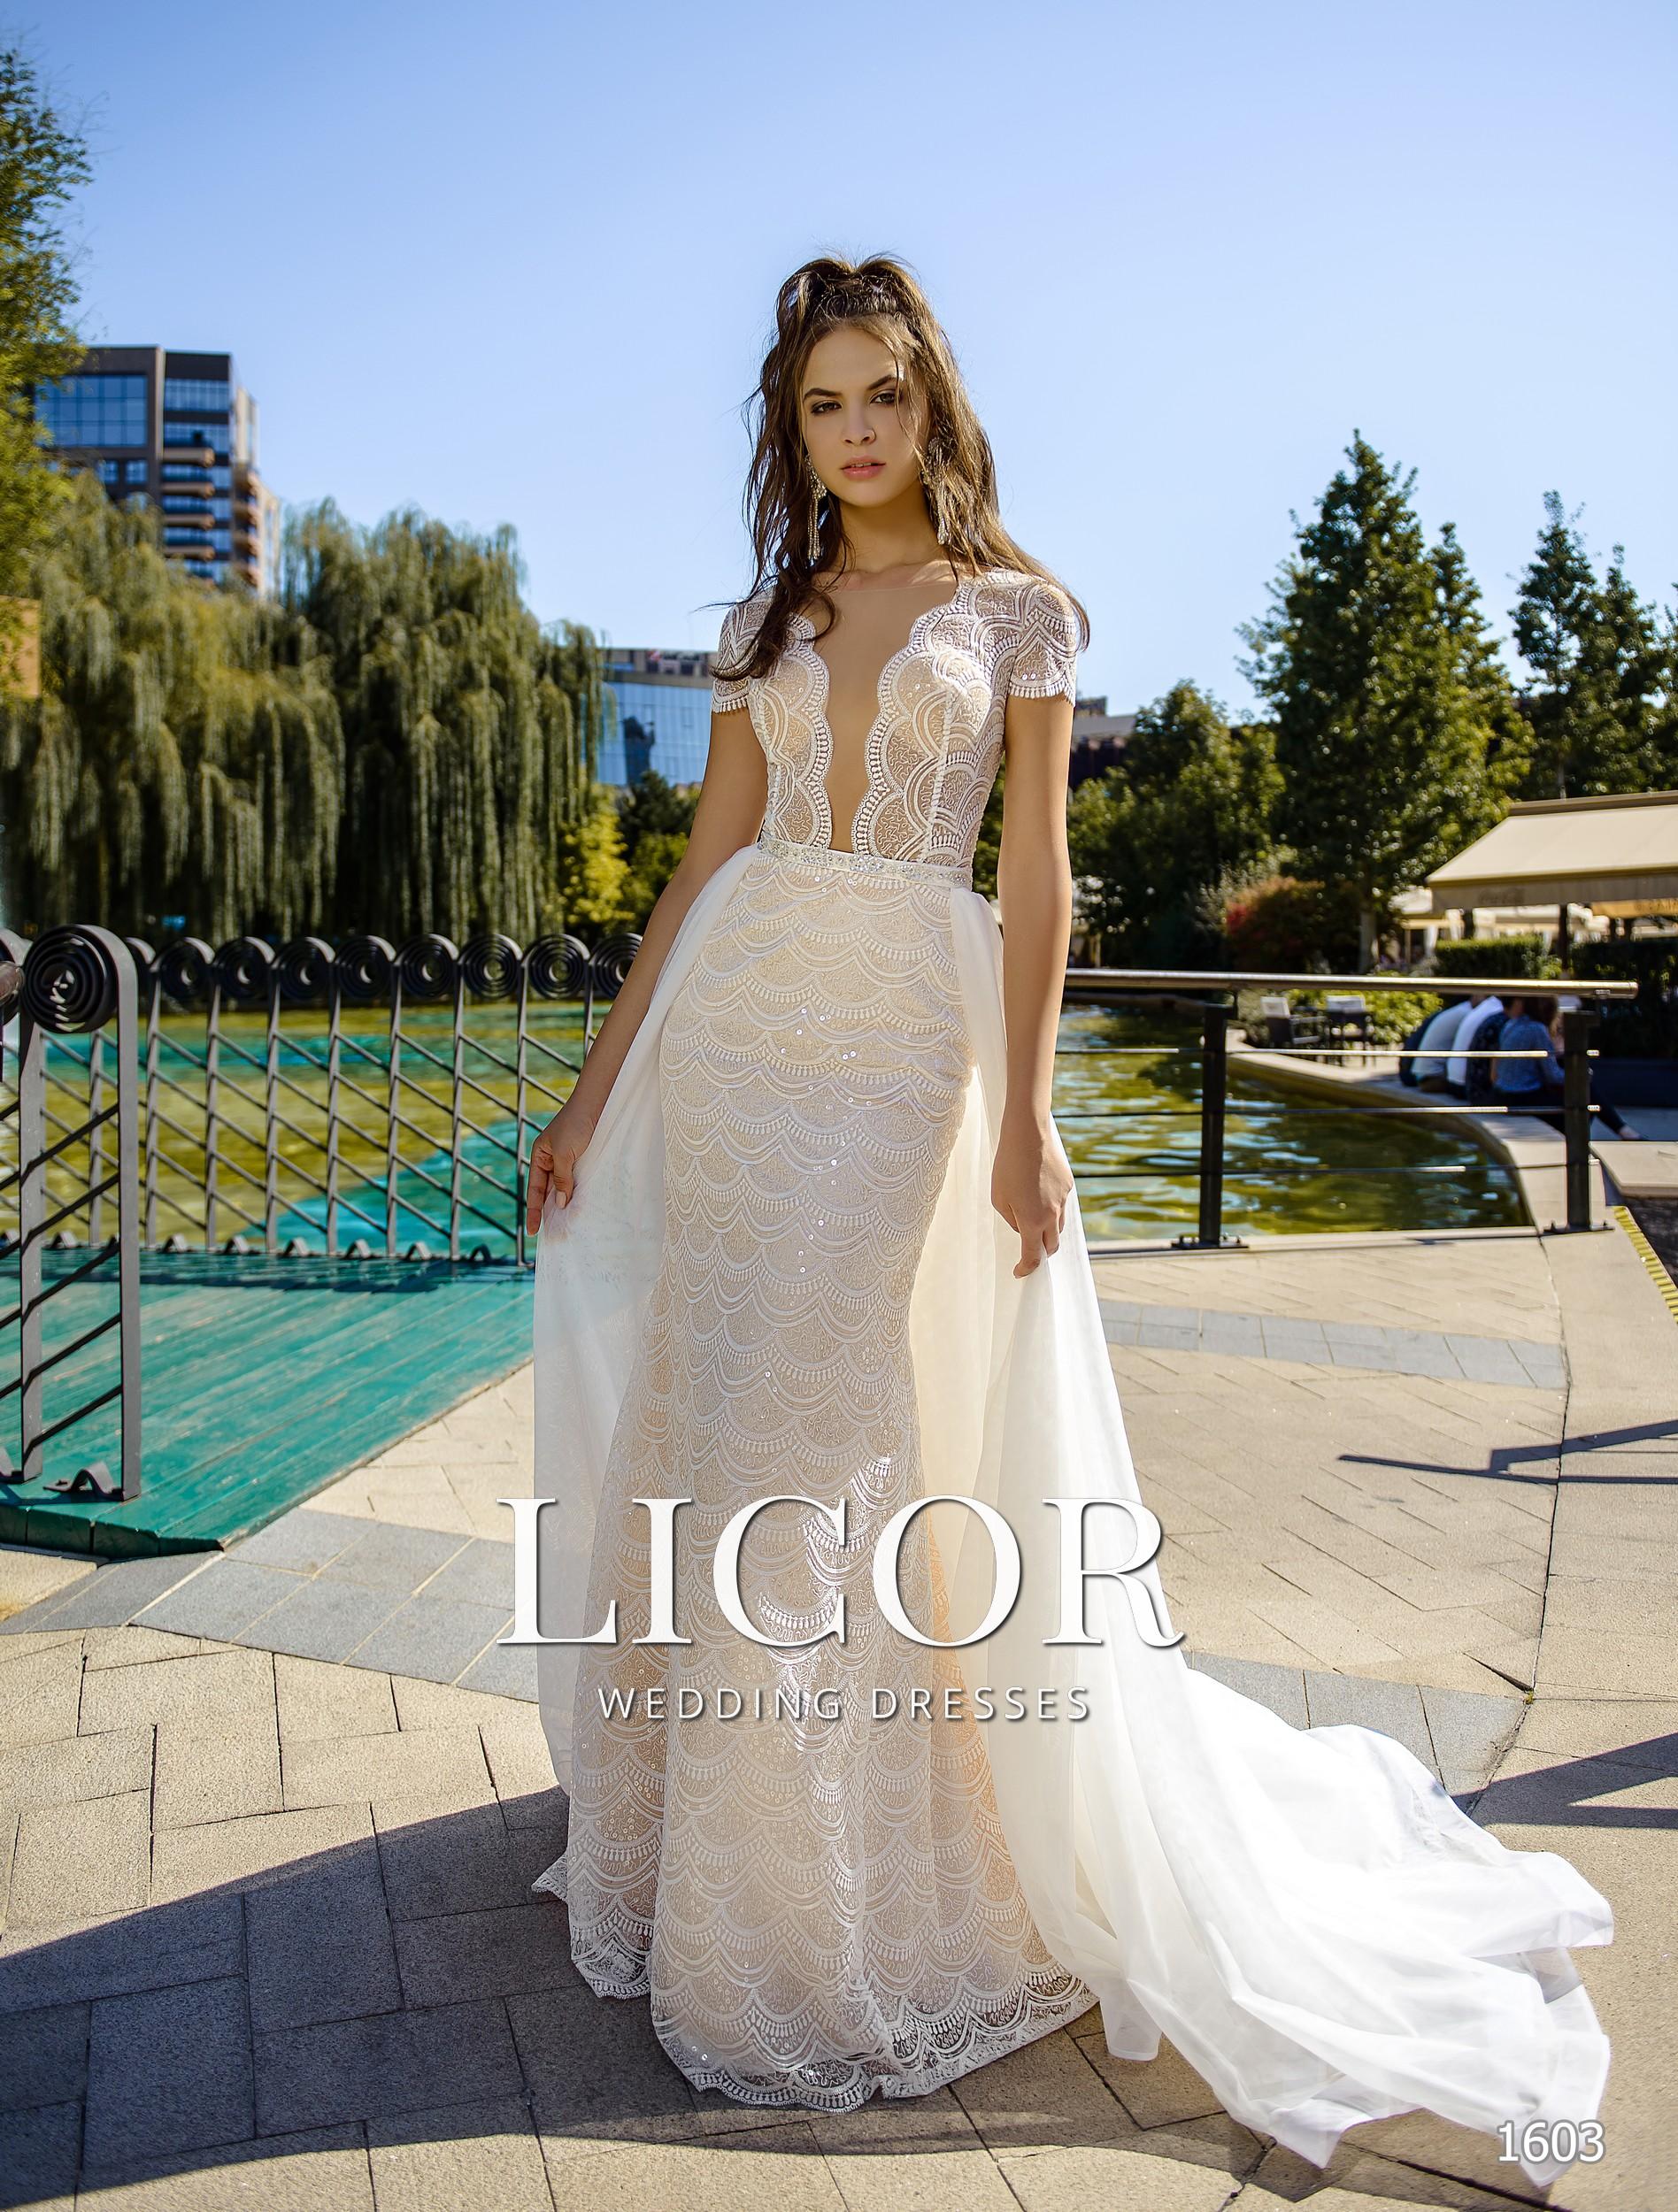 http://licor.com.ua/images/stories/virtuemart/product/1603(1).jpg